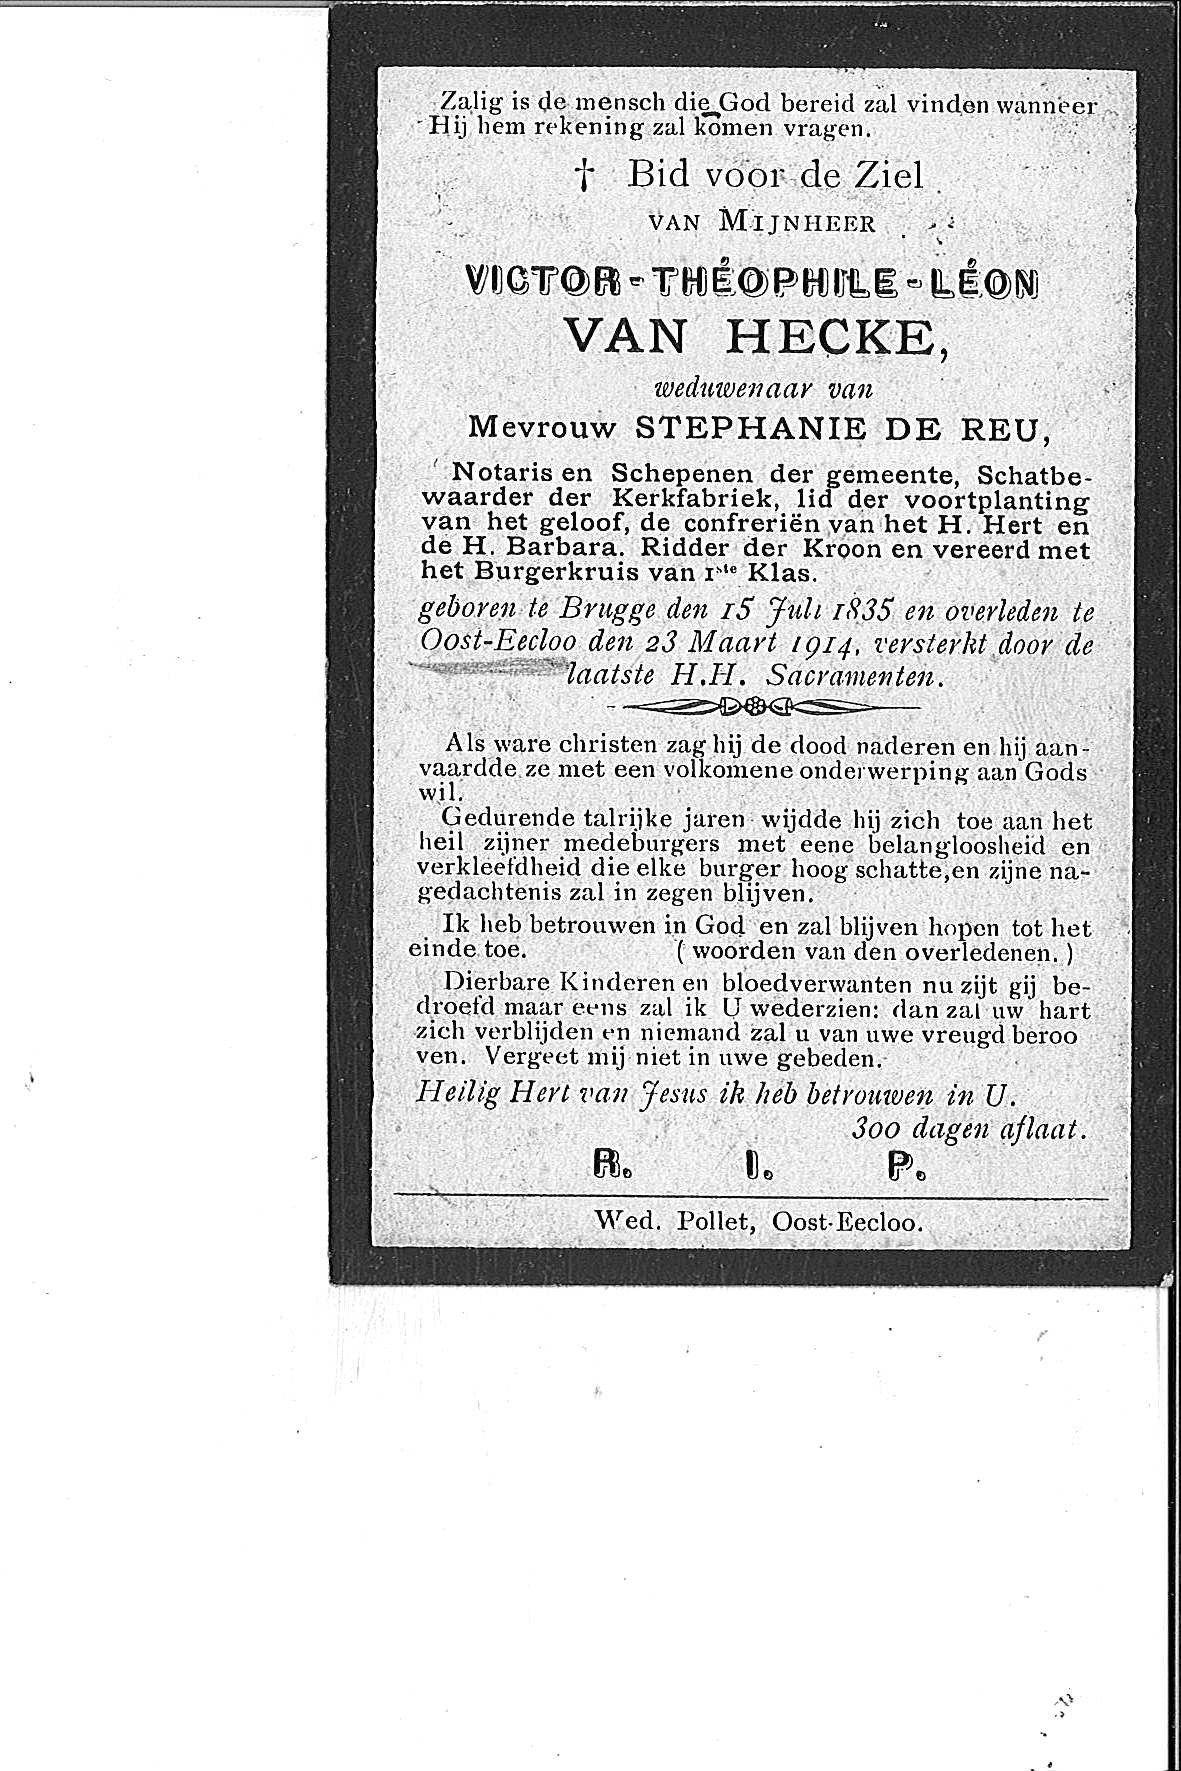 Van Hecke Victor Théophile Léon